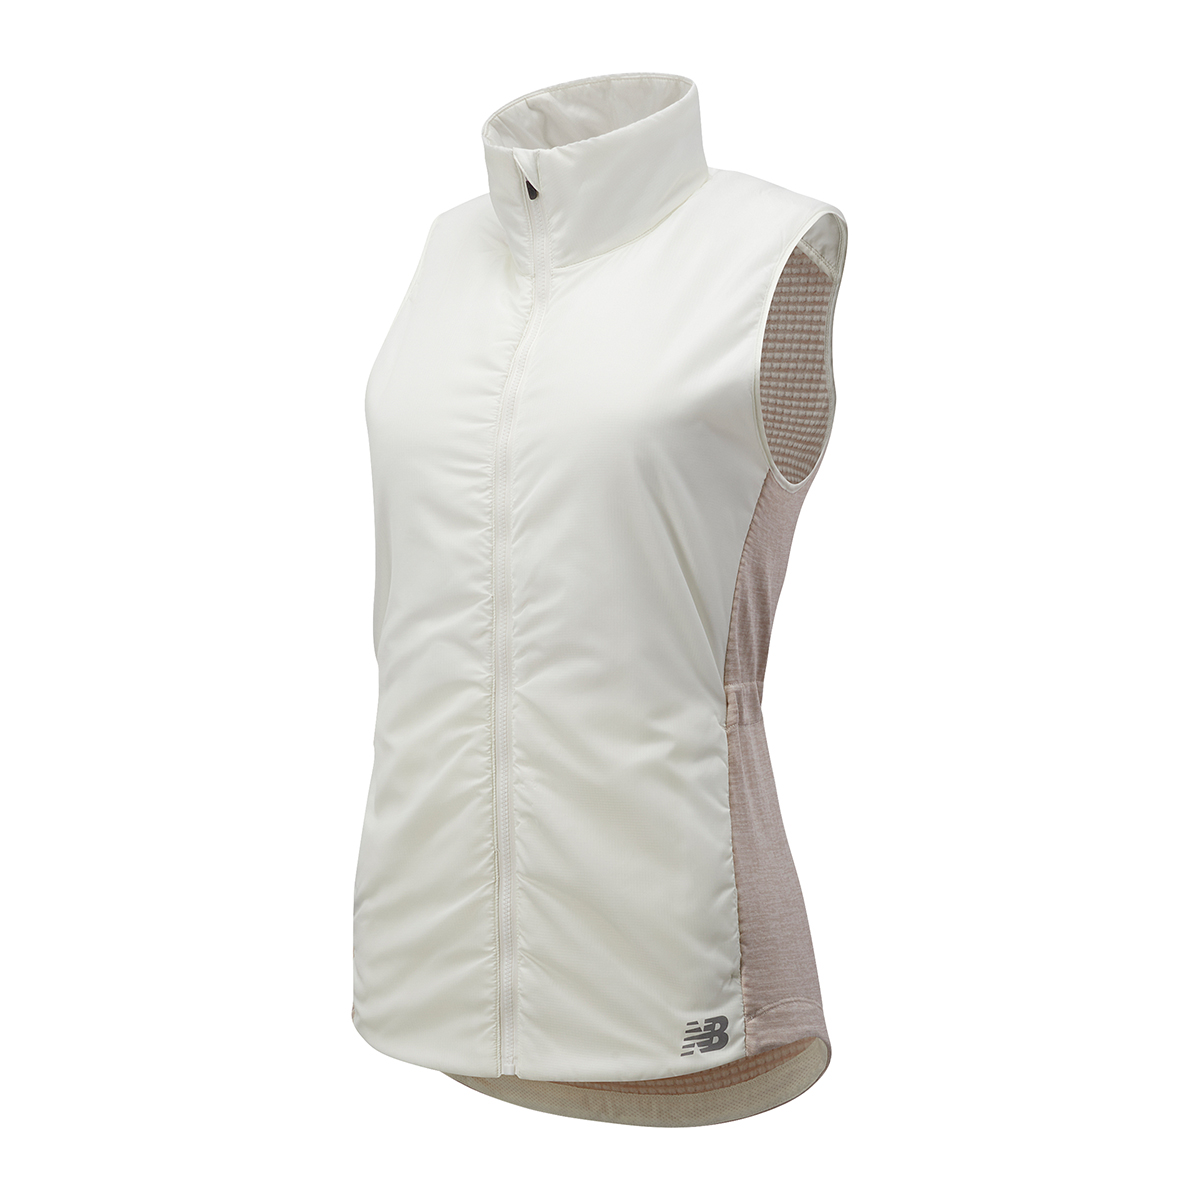 Women's New Balance Heat Grid Vest - Color: Sea Salt Heather - Size: L, Sea Salt Heather, large, image 1